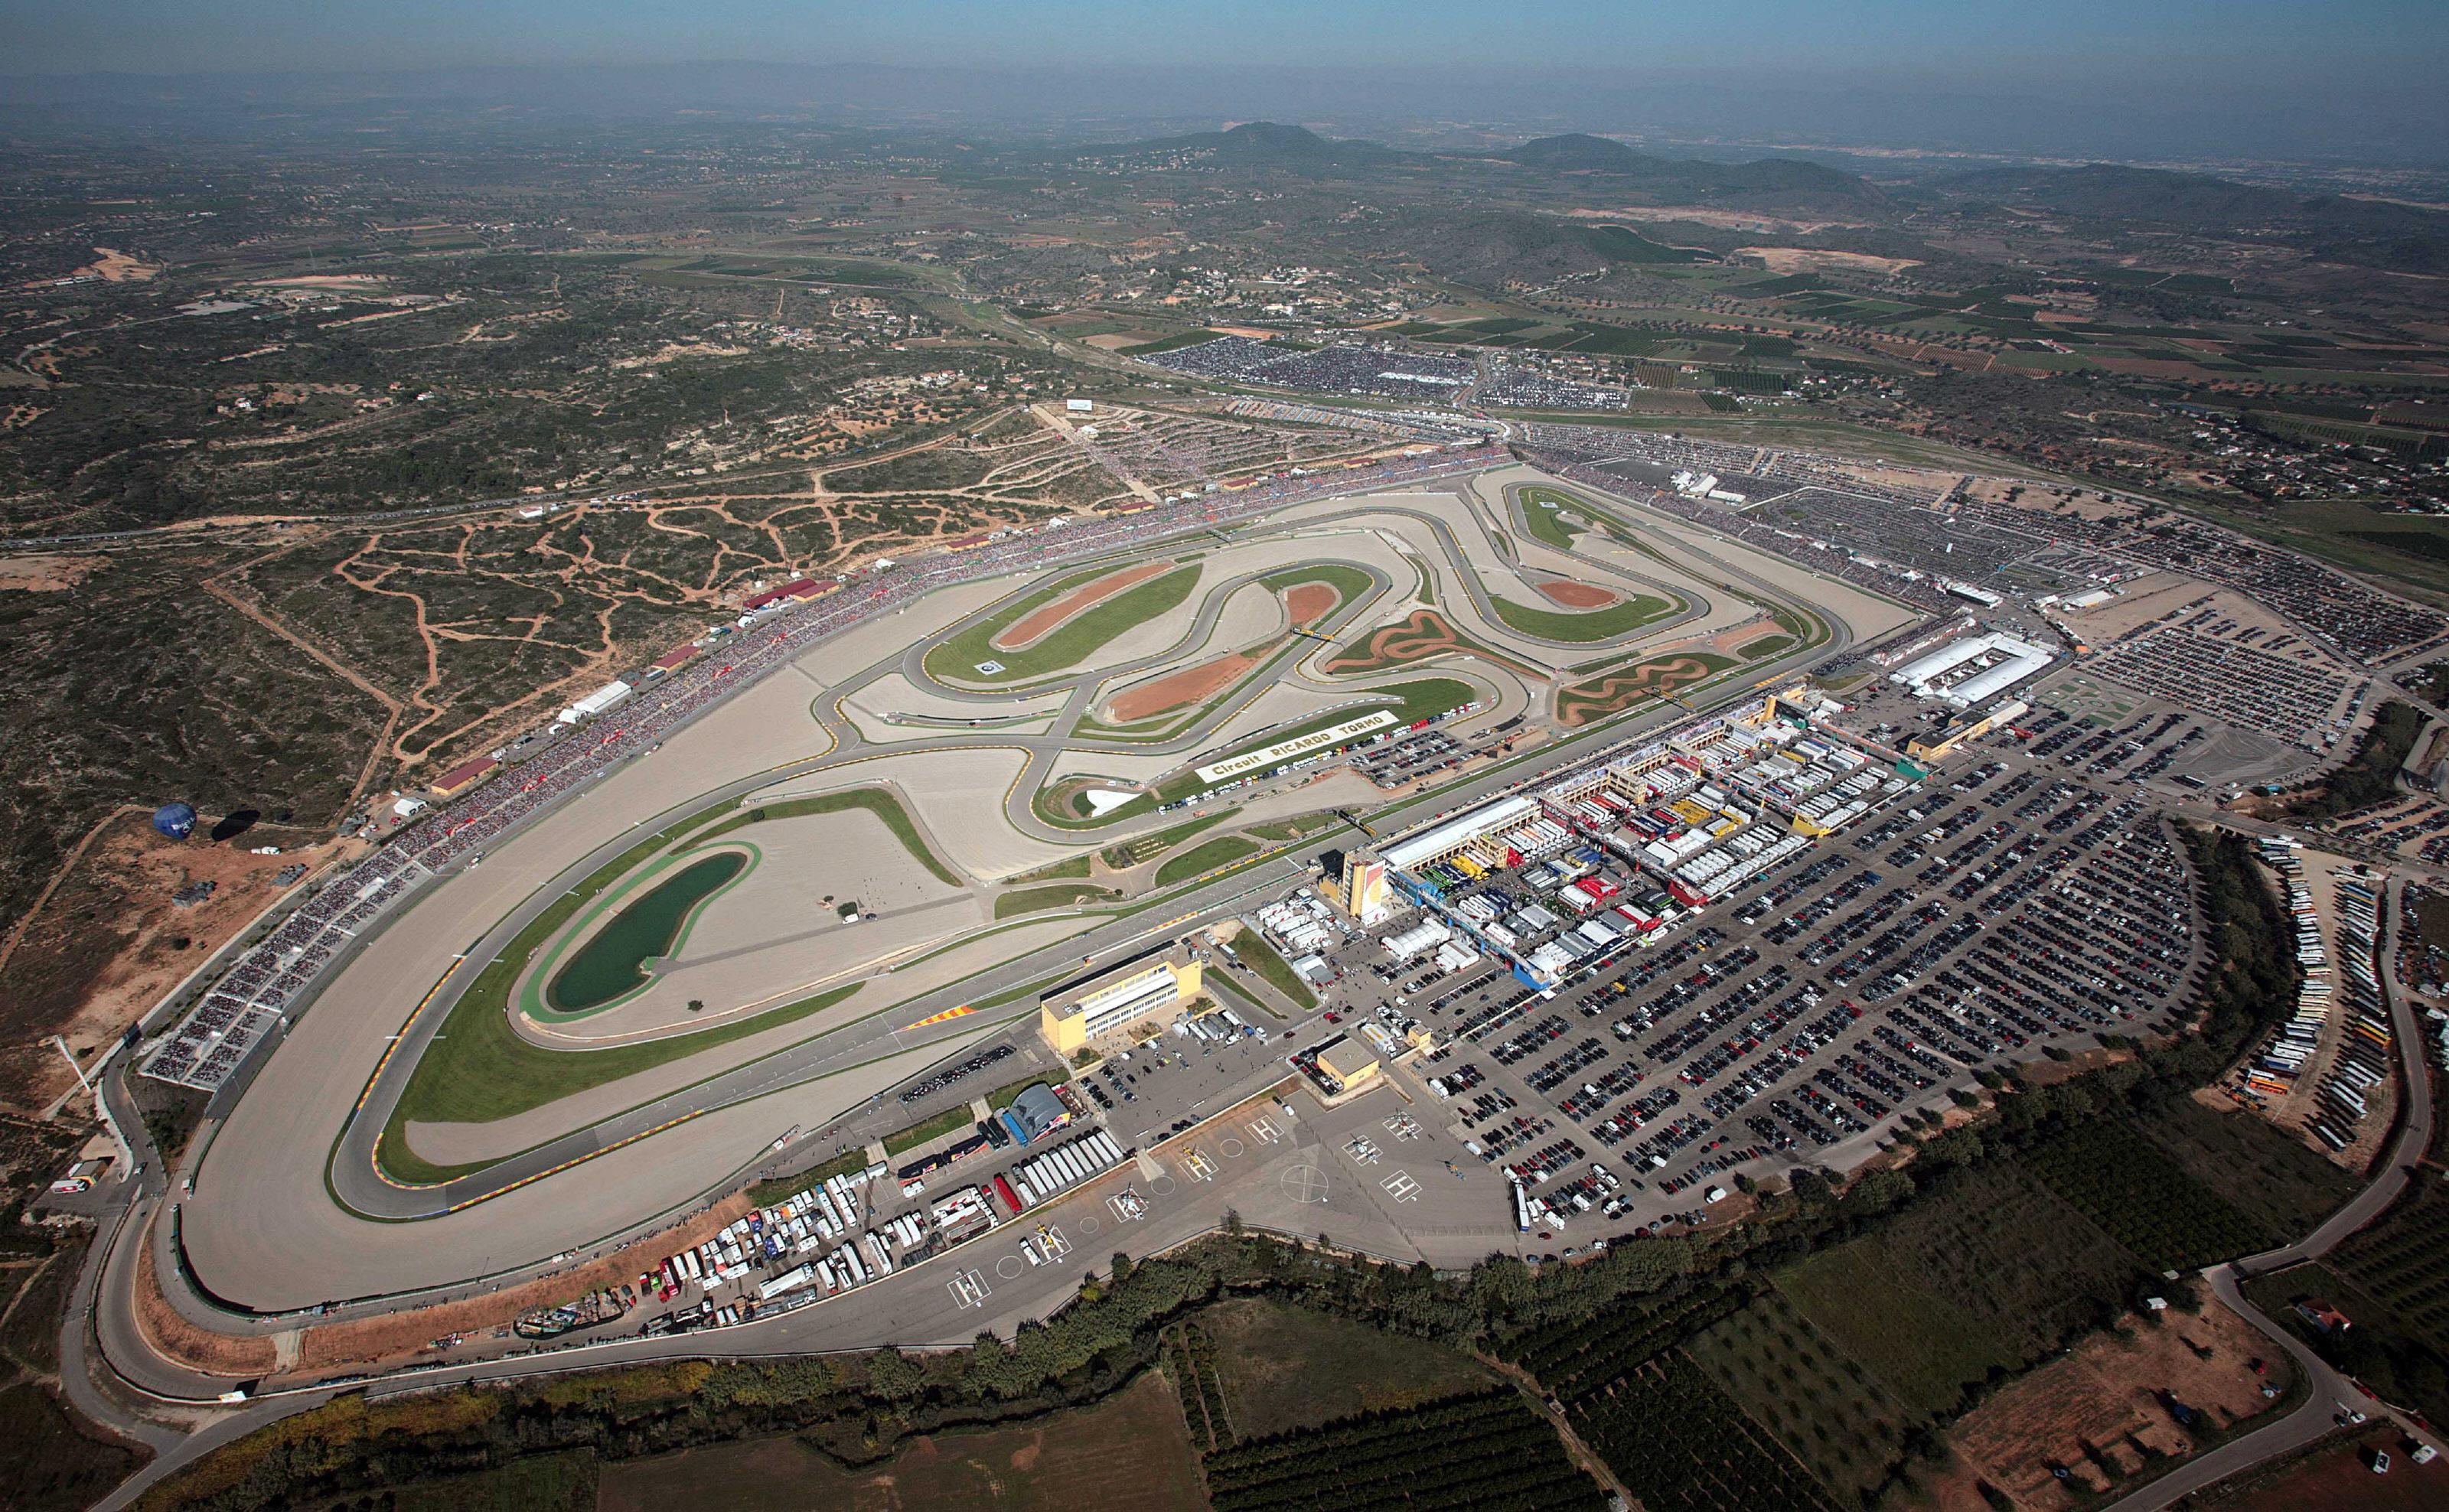 Circuito Valencia : Gc xjd circuit de la comunitat valenciana ricardo tormo